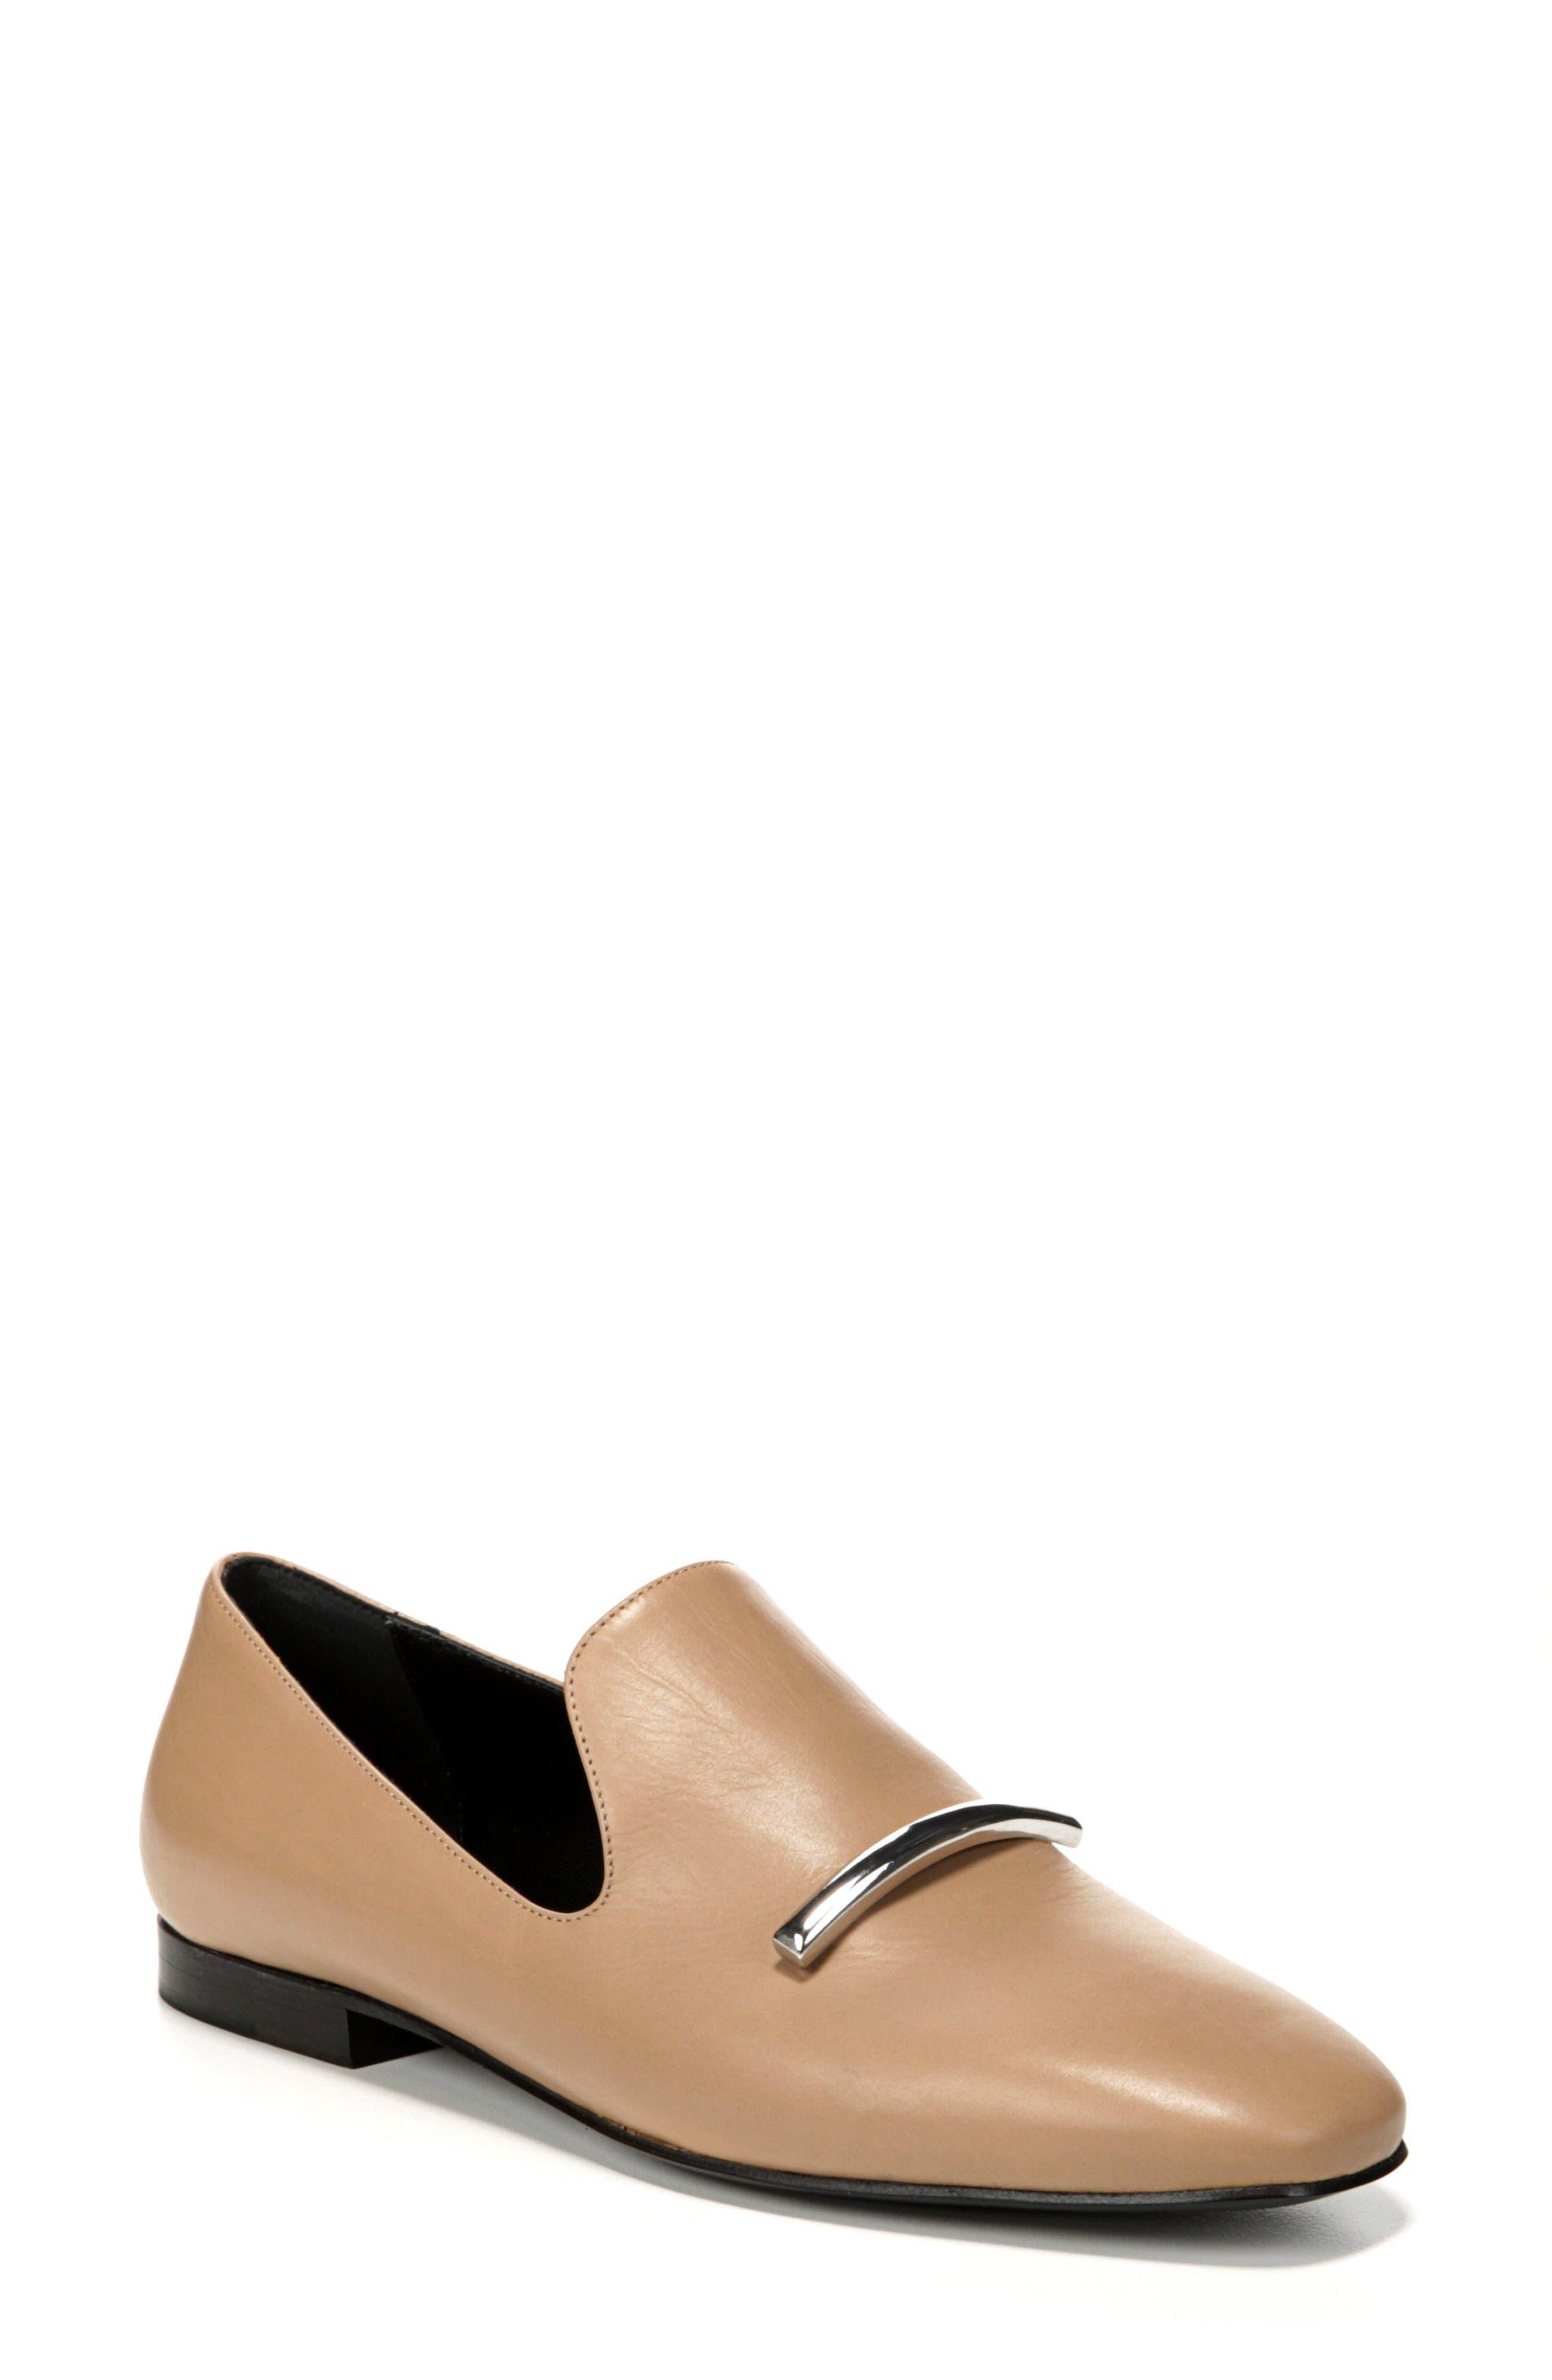 Tallis Flat Loafer,                         Main,                         color, DESERT LEATHER